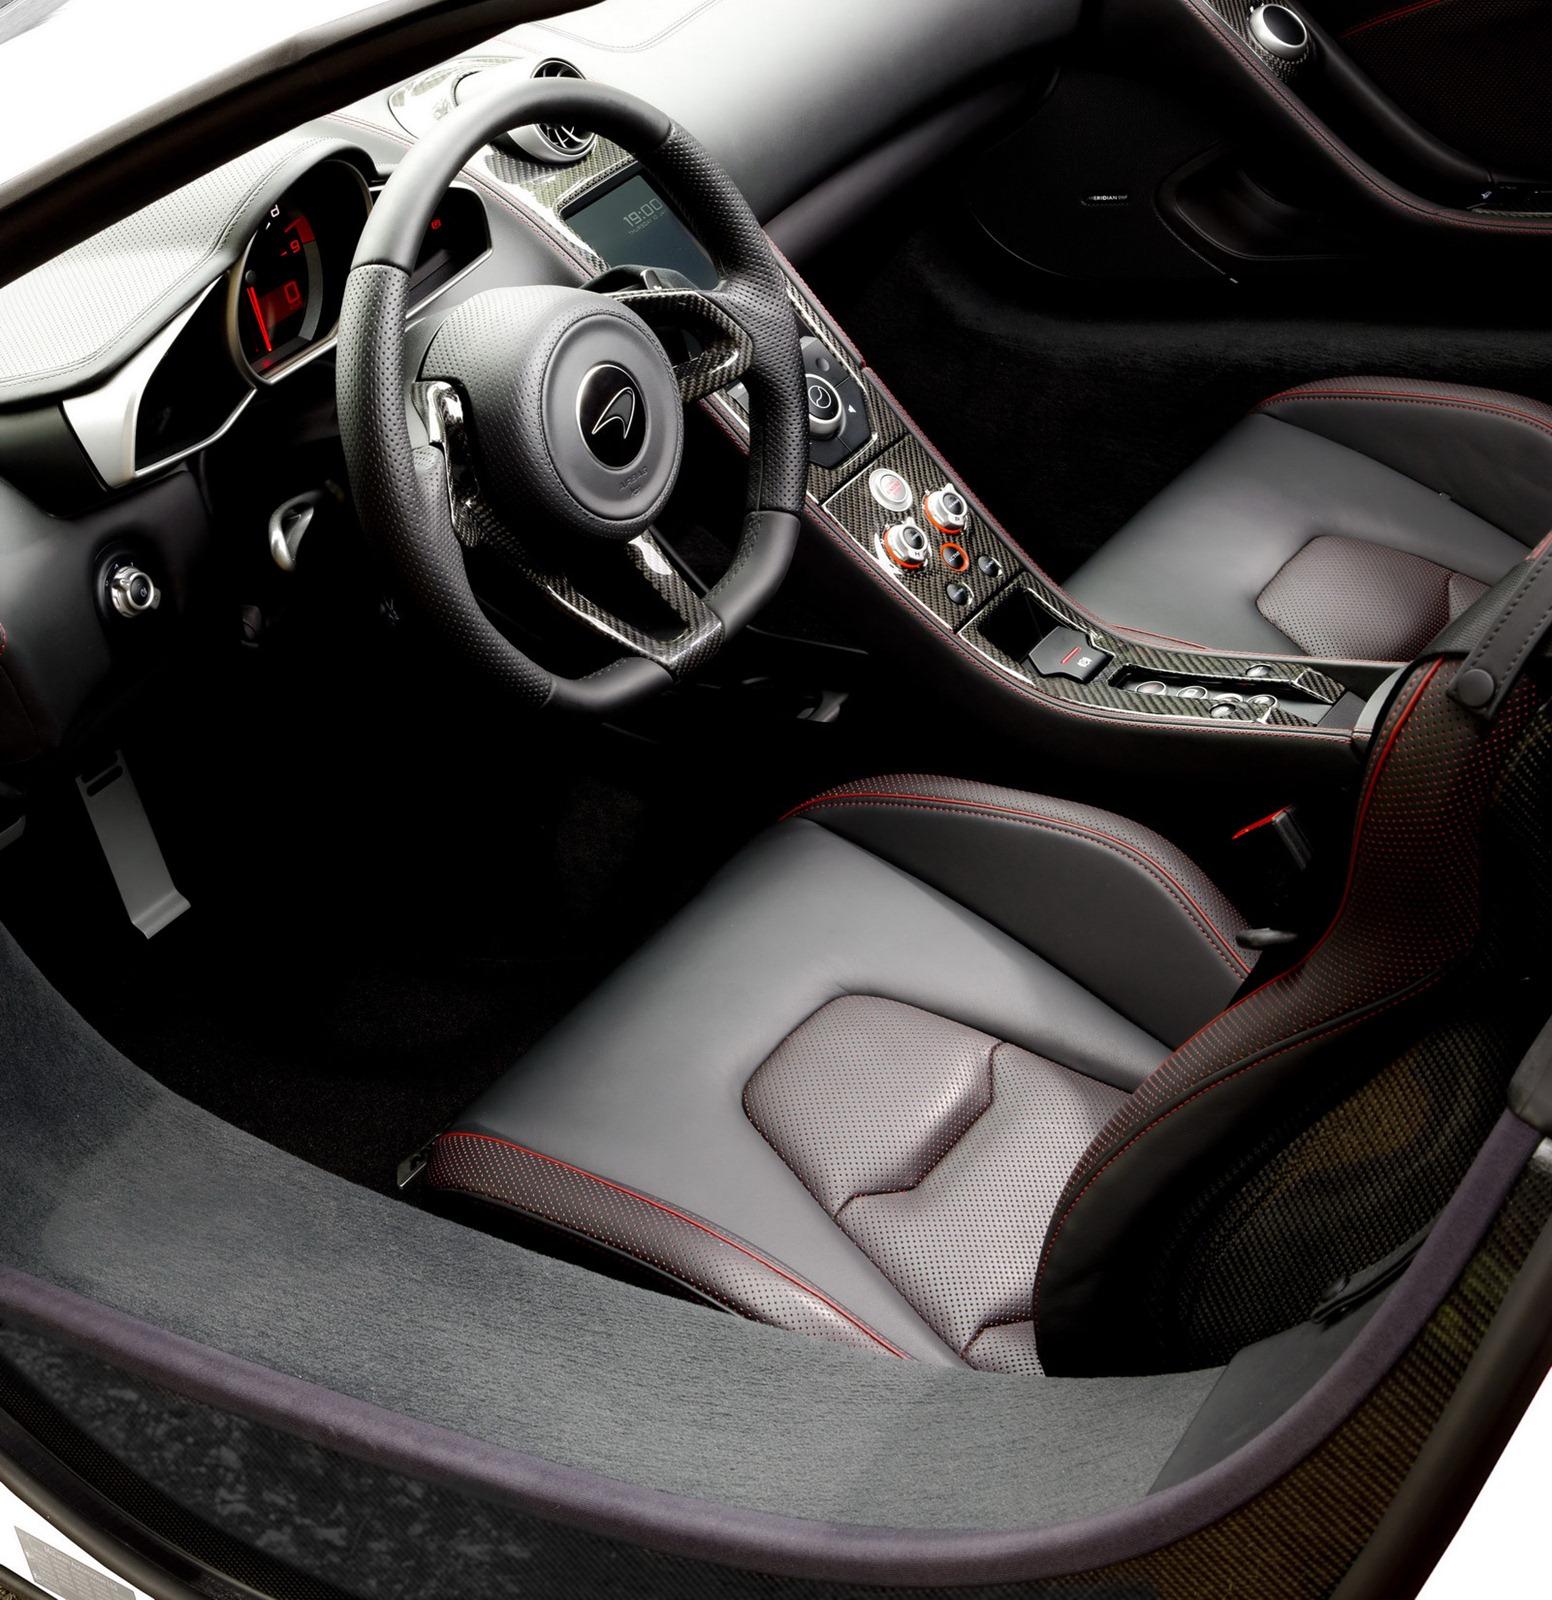 2013-McLaren-MP4-12C-7%5B2%5D.jpg